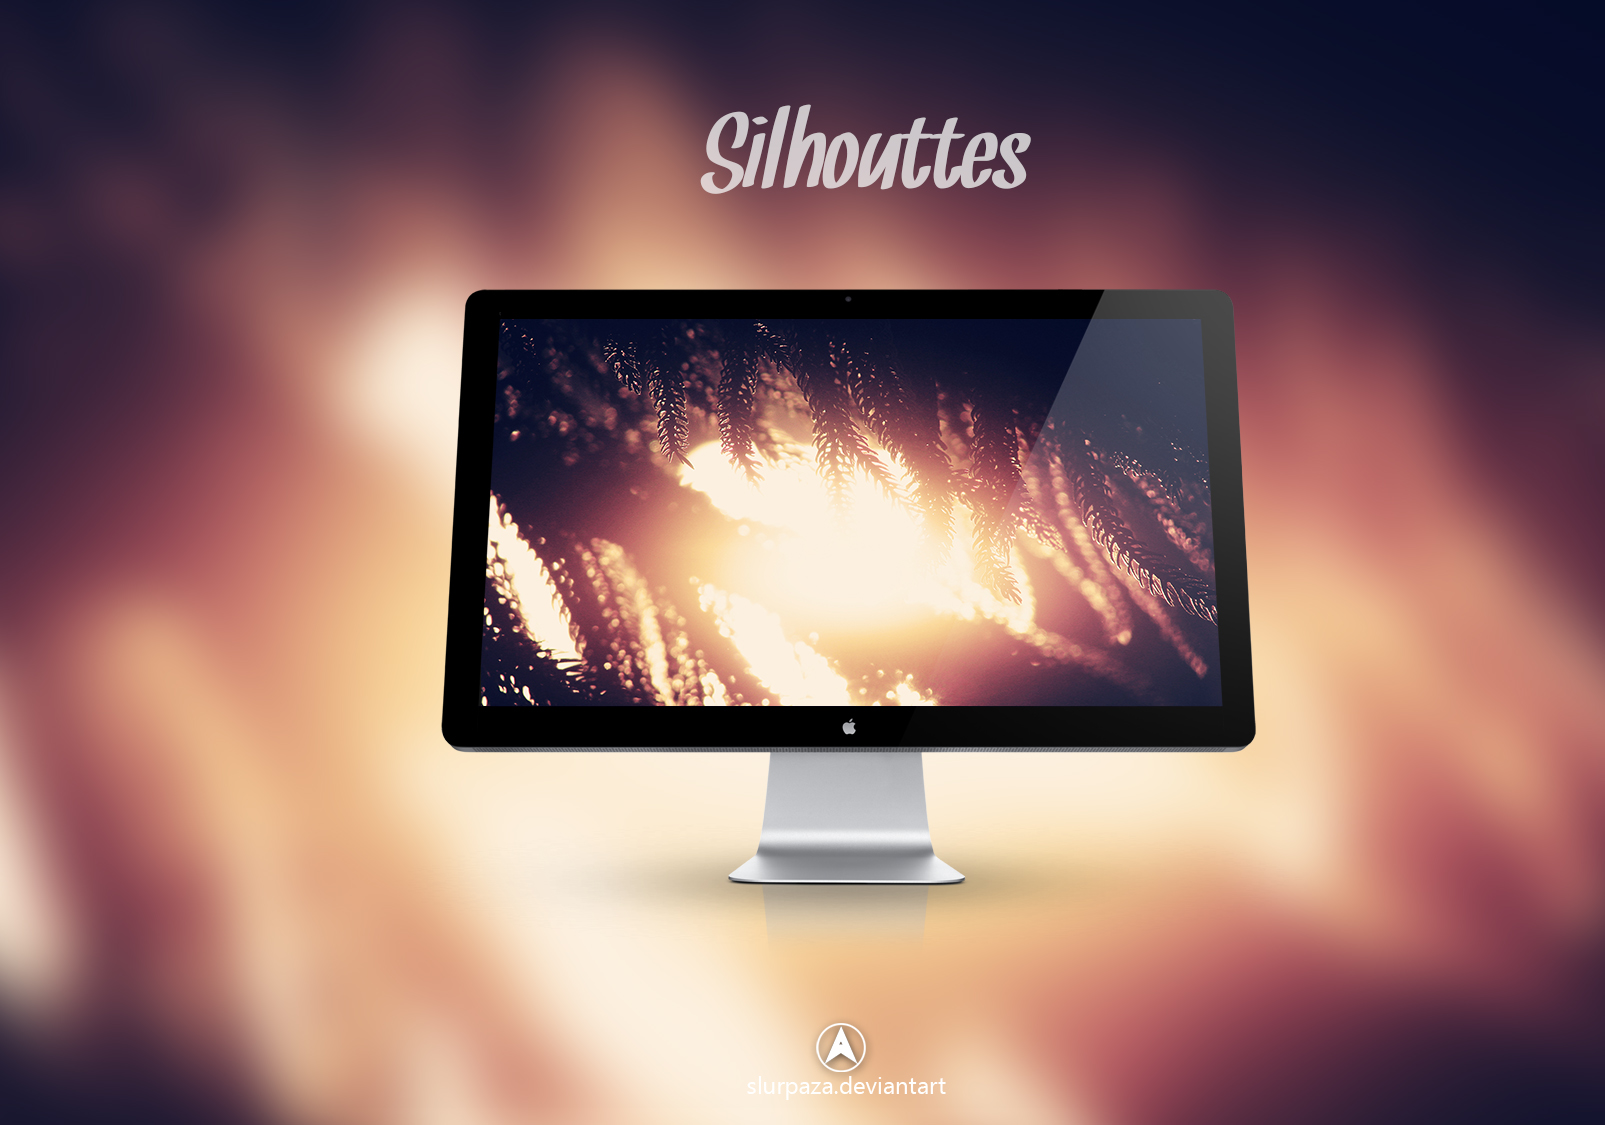 Silhouttes by Slurpaza